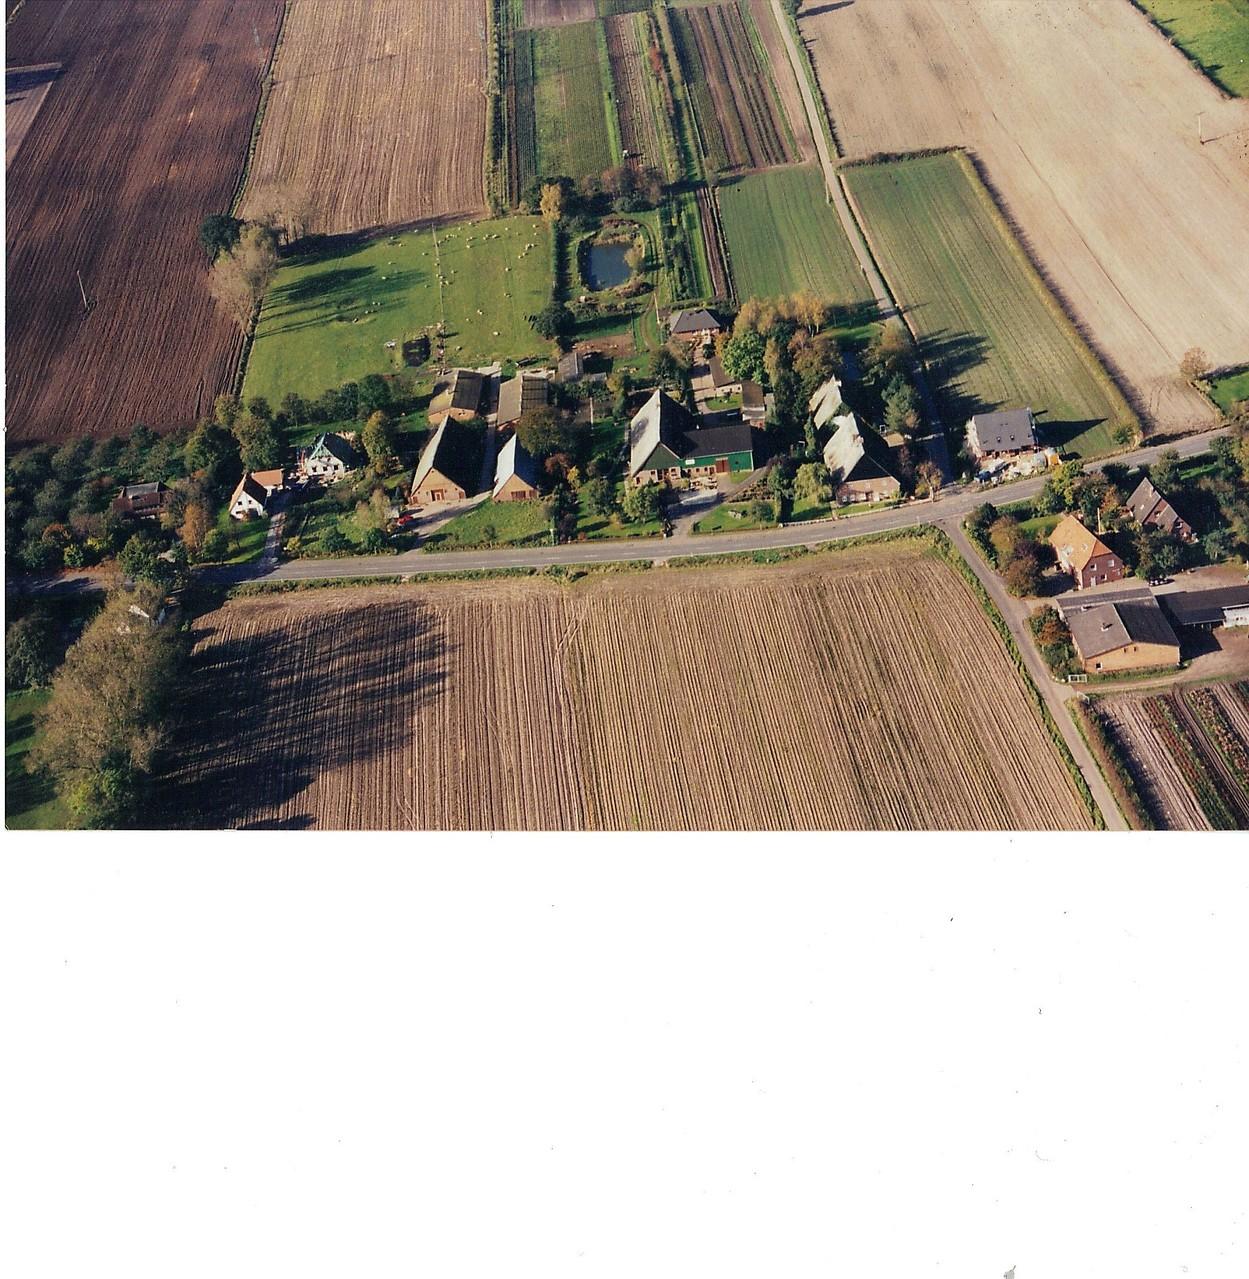 Der linke Hof ist der Hof Hellgrund